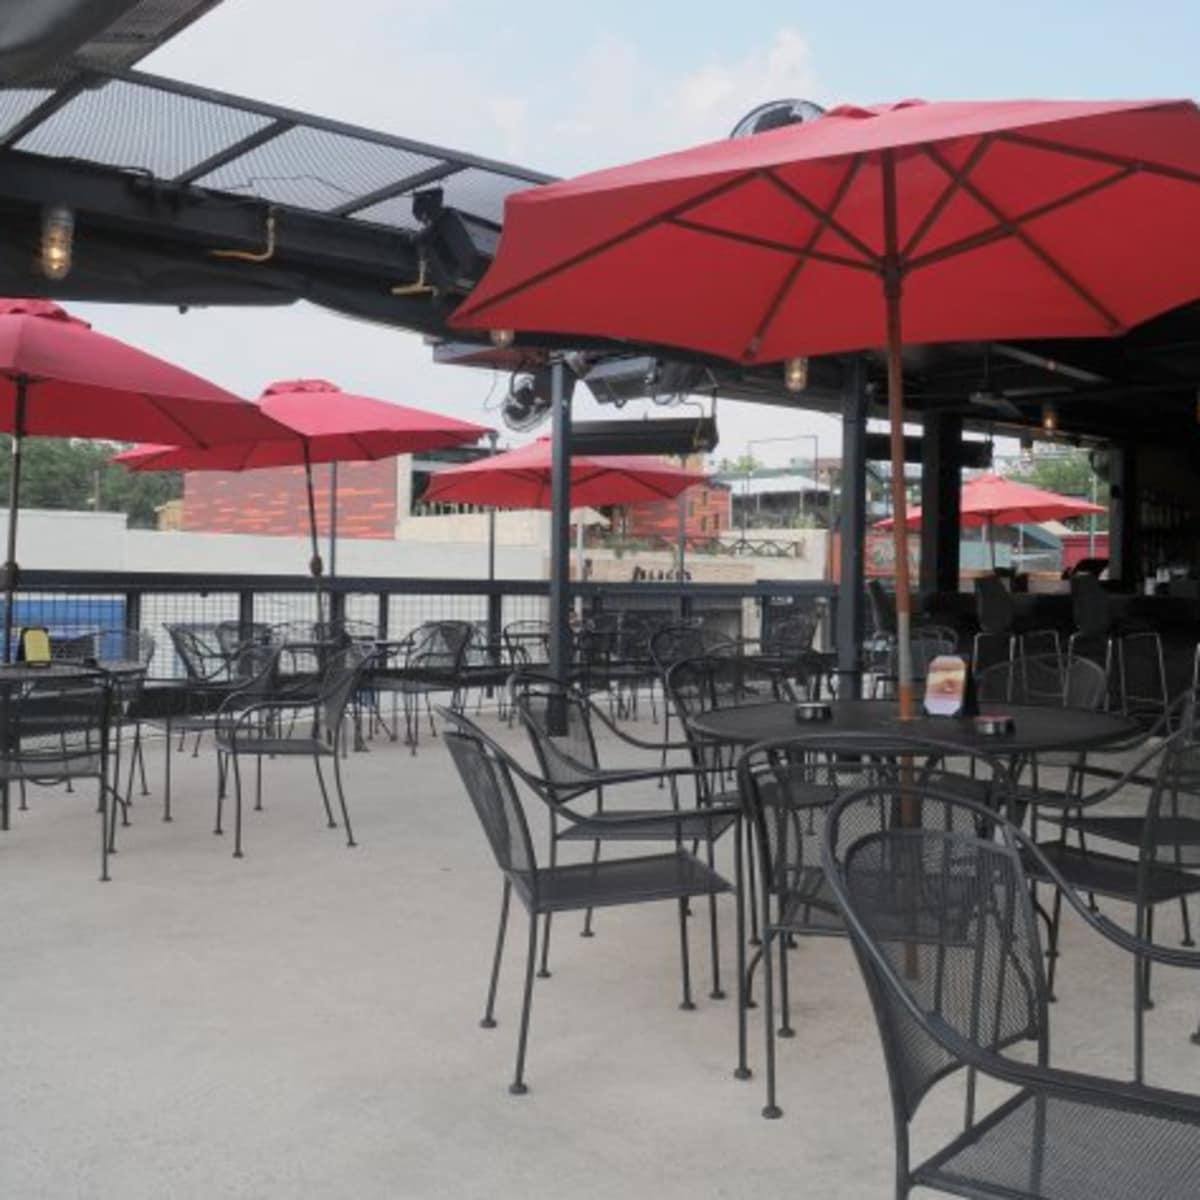 Austin_photo: places_drinks_molotov_roof